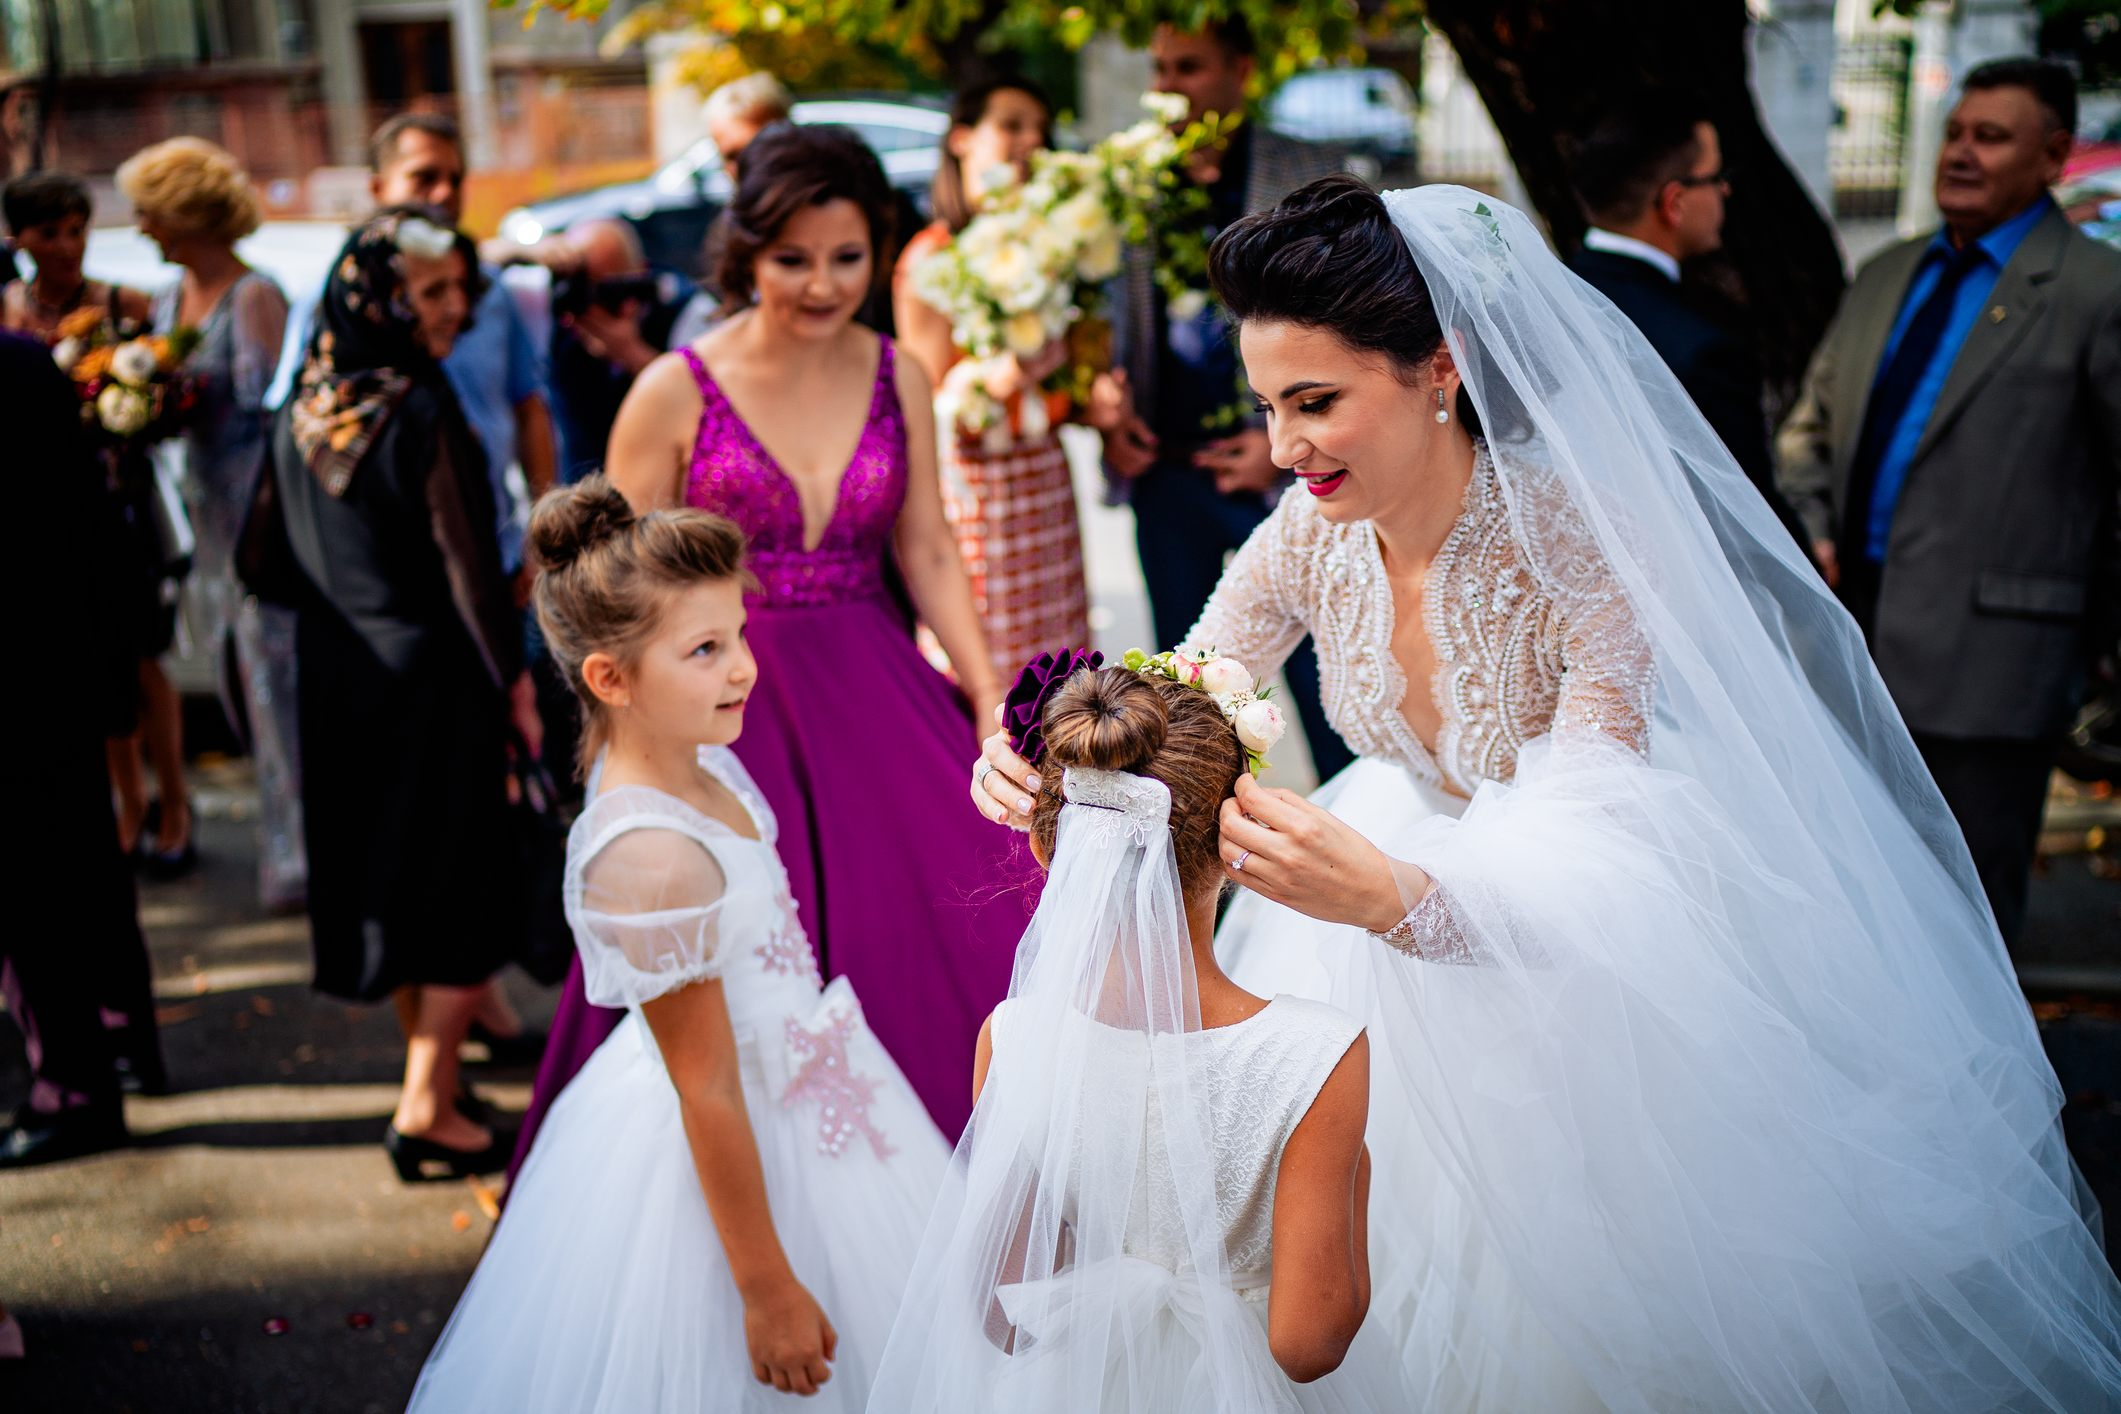 fotograf nunta bucuresti laurentiu nica  7 - Lorena & Matei | Fotografii nunta Bucuresti | Restaurant Domeniul cu Ciresi